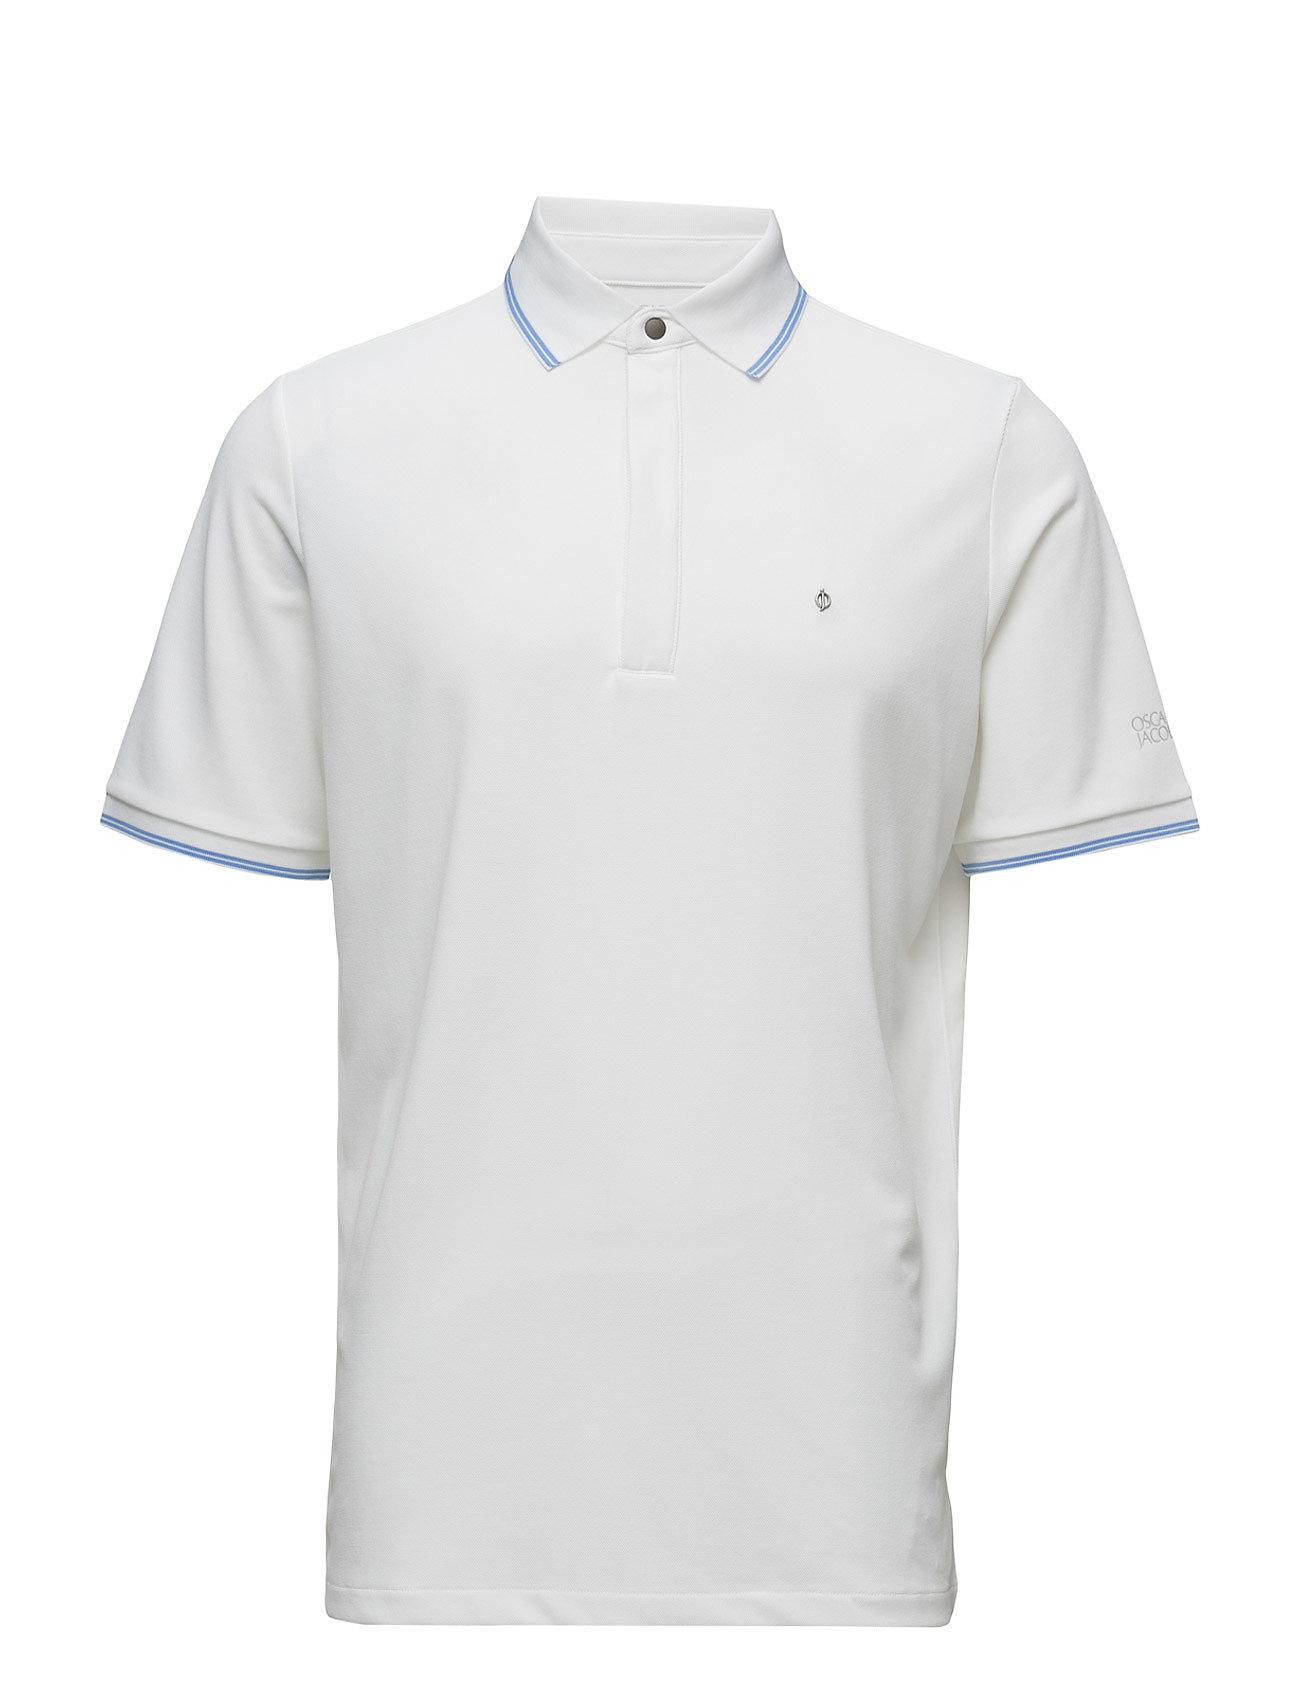 Alric Pin Poloshirt Oscar Jacobson Golf Kortærmede polo t-shirts til Herrer i